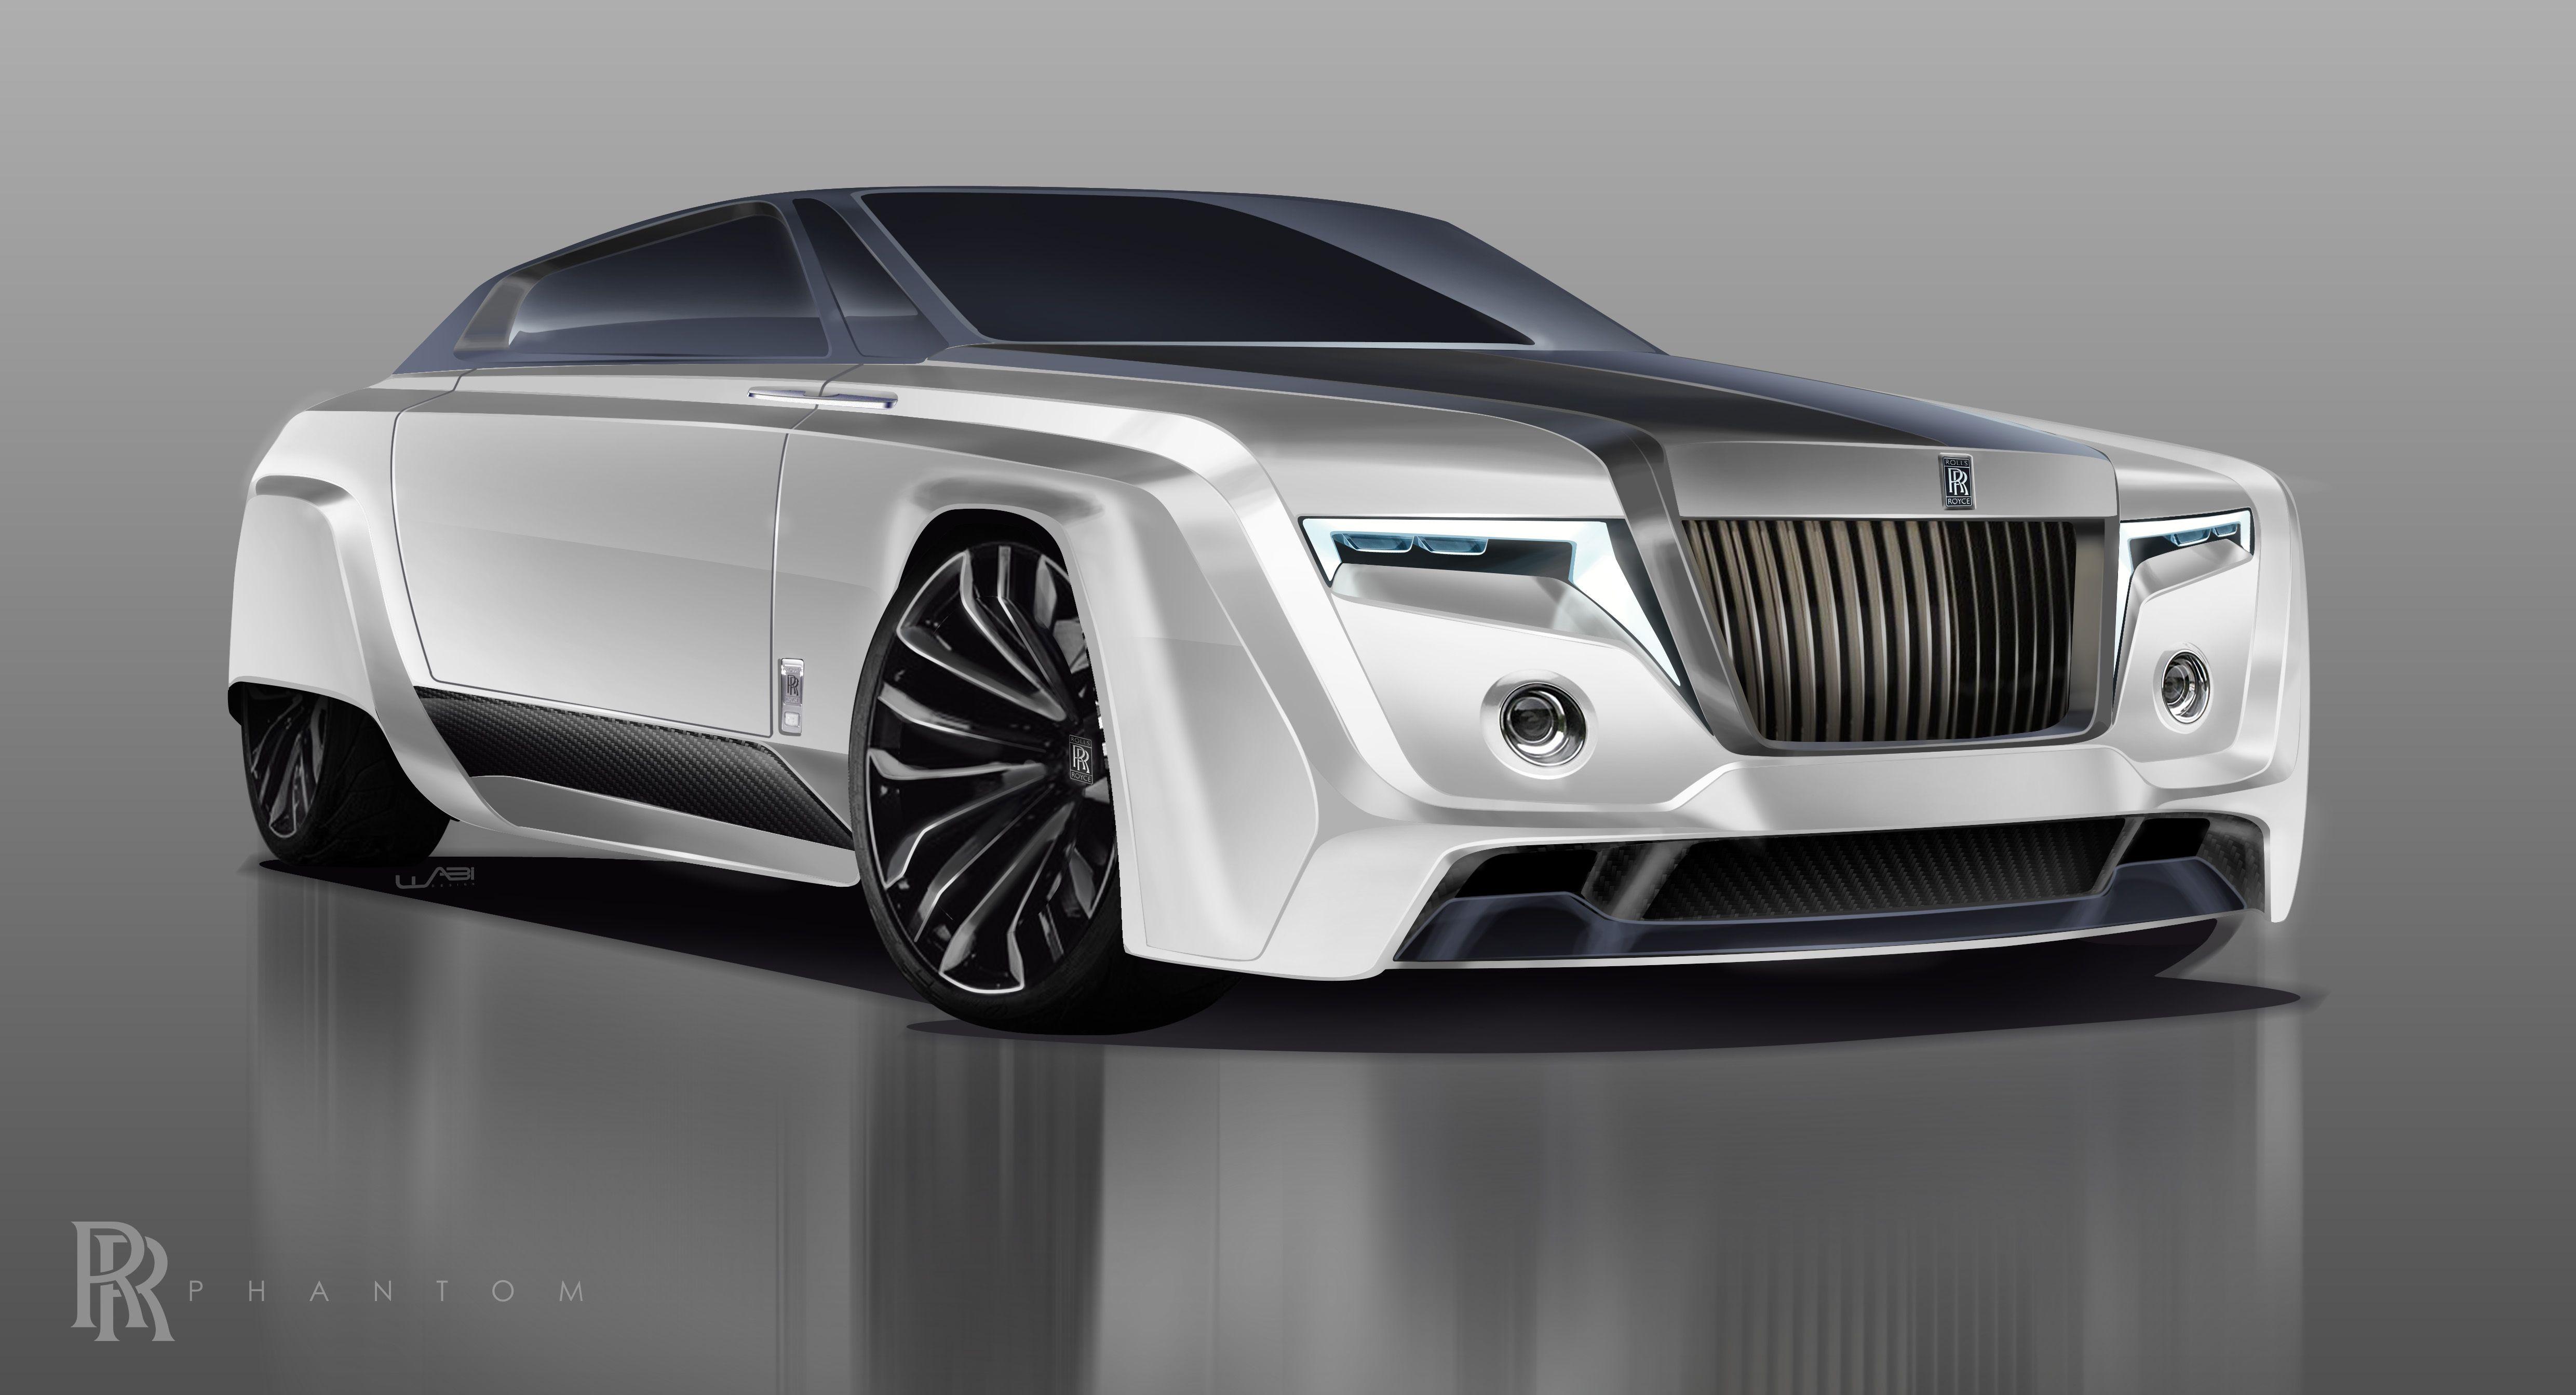 2050 Rolls Royce Phantom Final Render Adobe Photoshop Cc